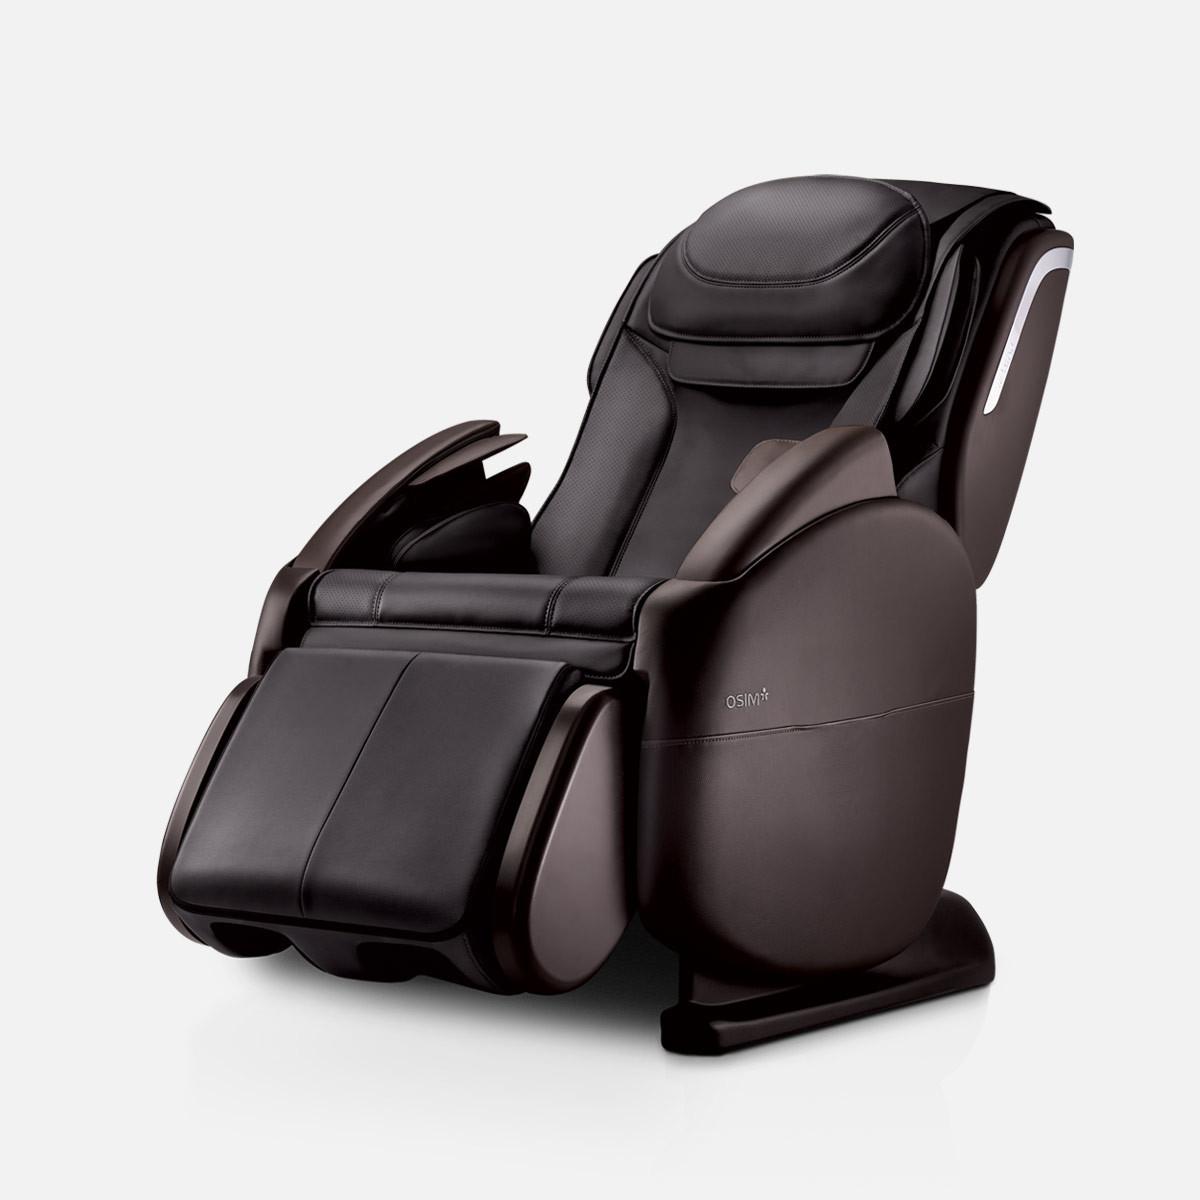 uDeluxe Massage Chair